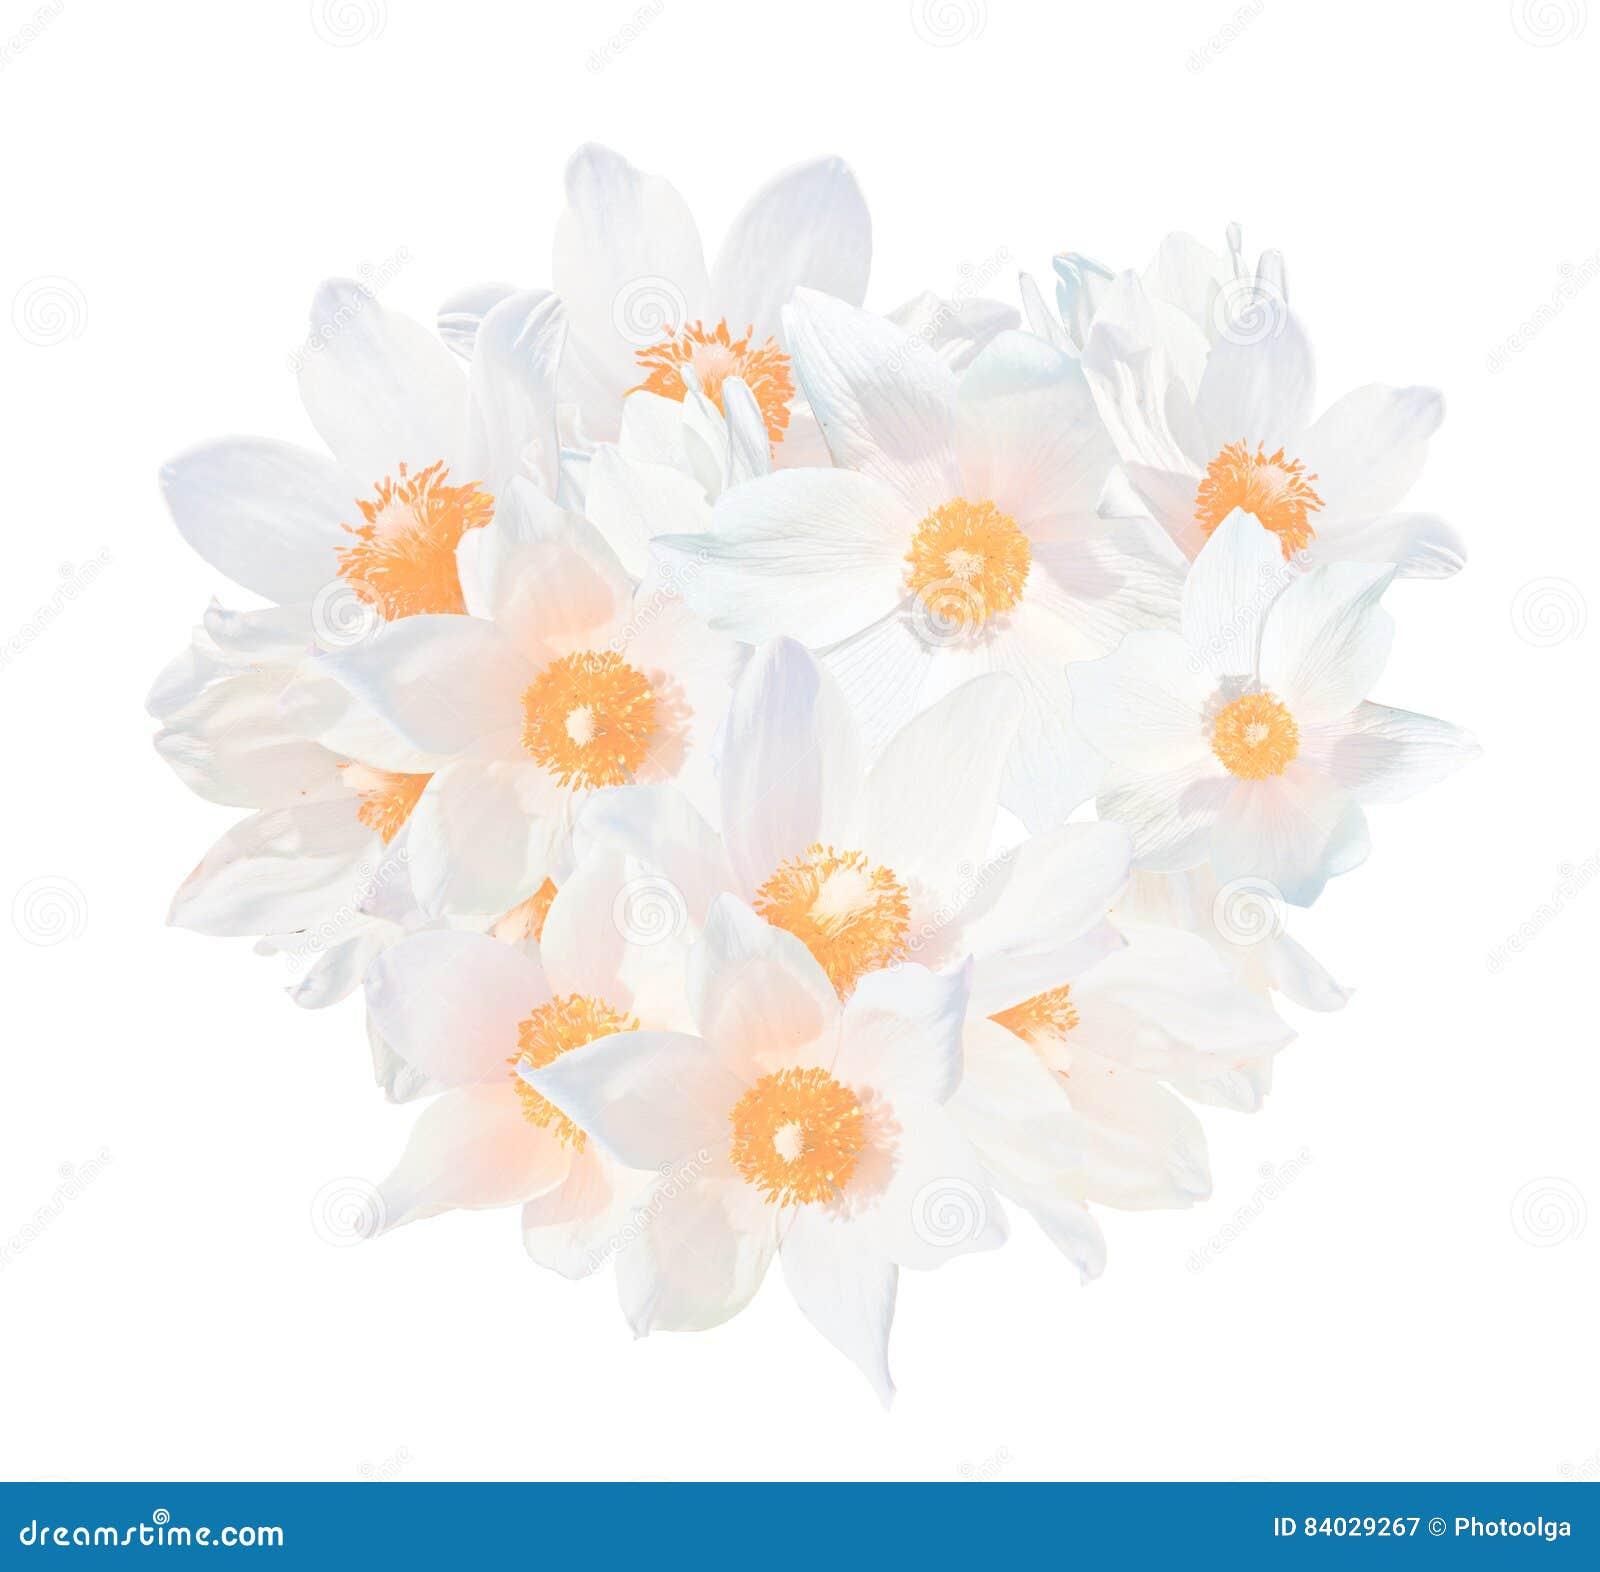 White snowdrops pulsatilla patens isolated on white background the white snowdrops pulsatilla patens isolated on white background the spring flowers grow in western siberia mightylinksfo